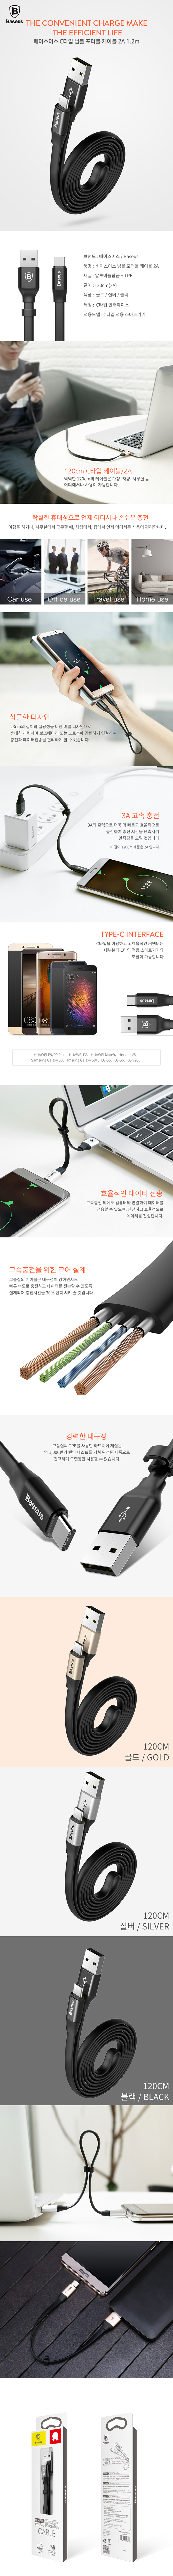 baseus_nimble_ctype_cable.jpg